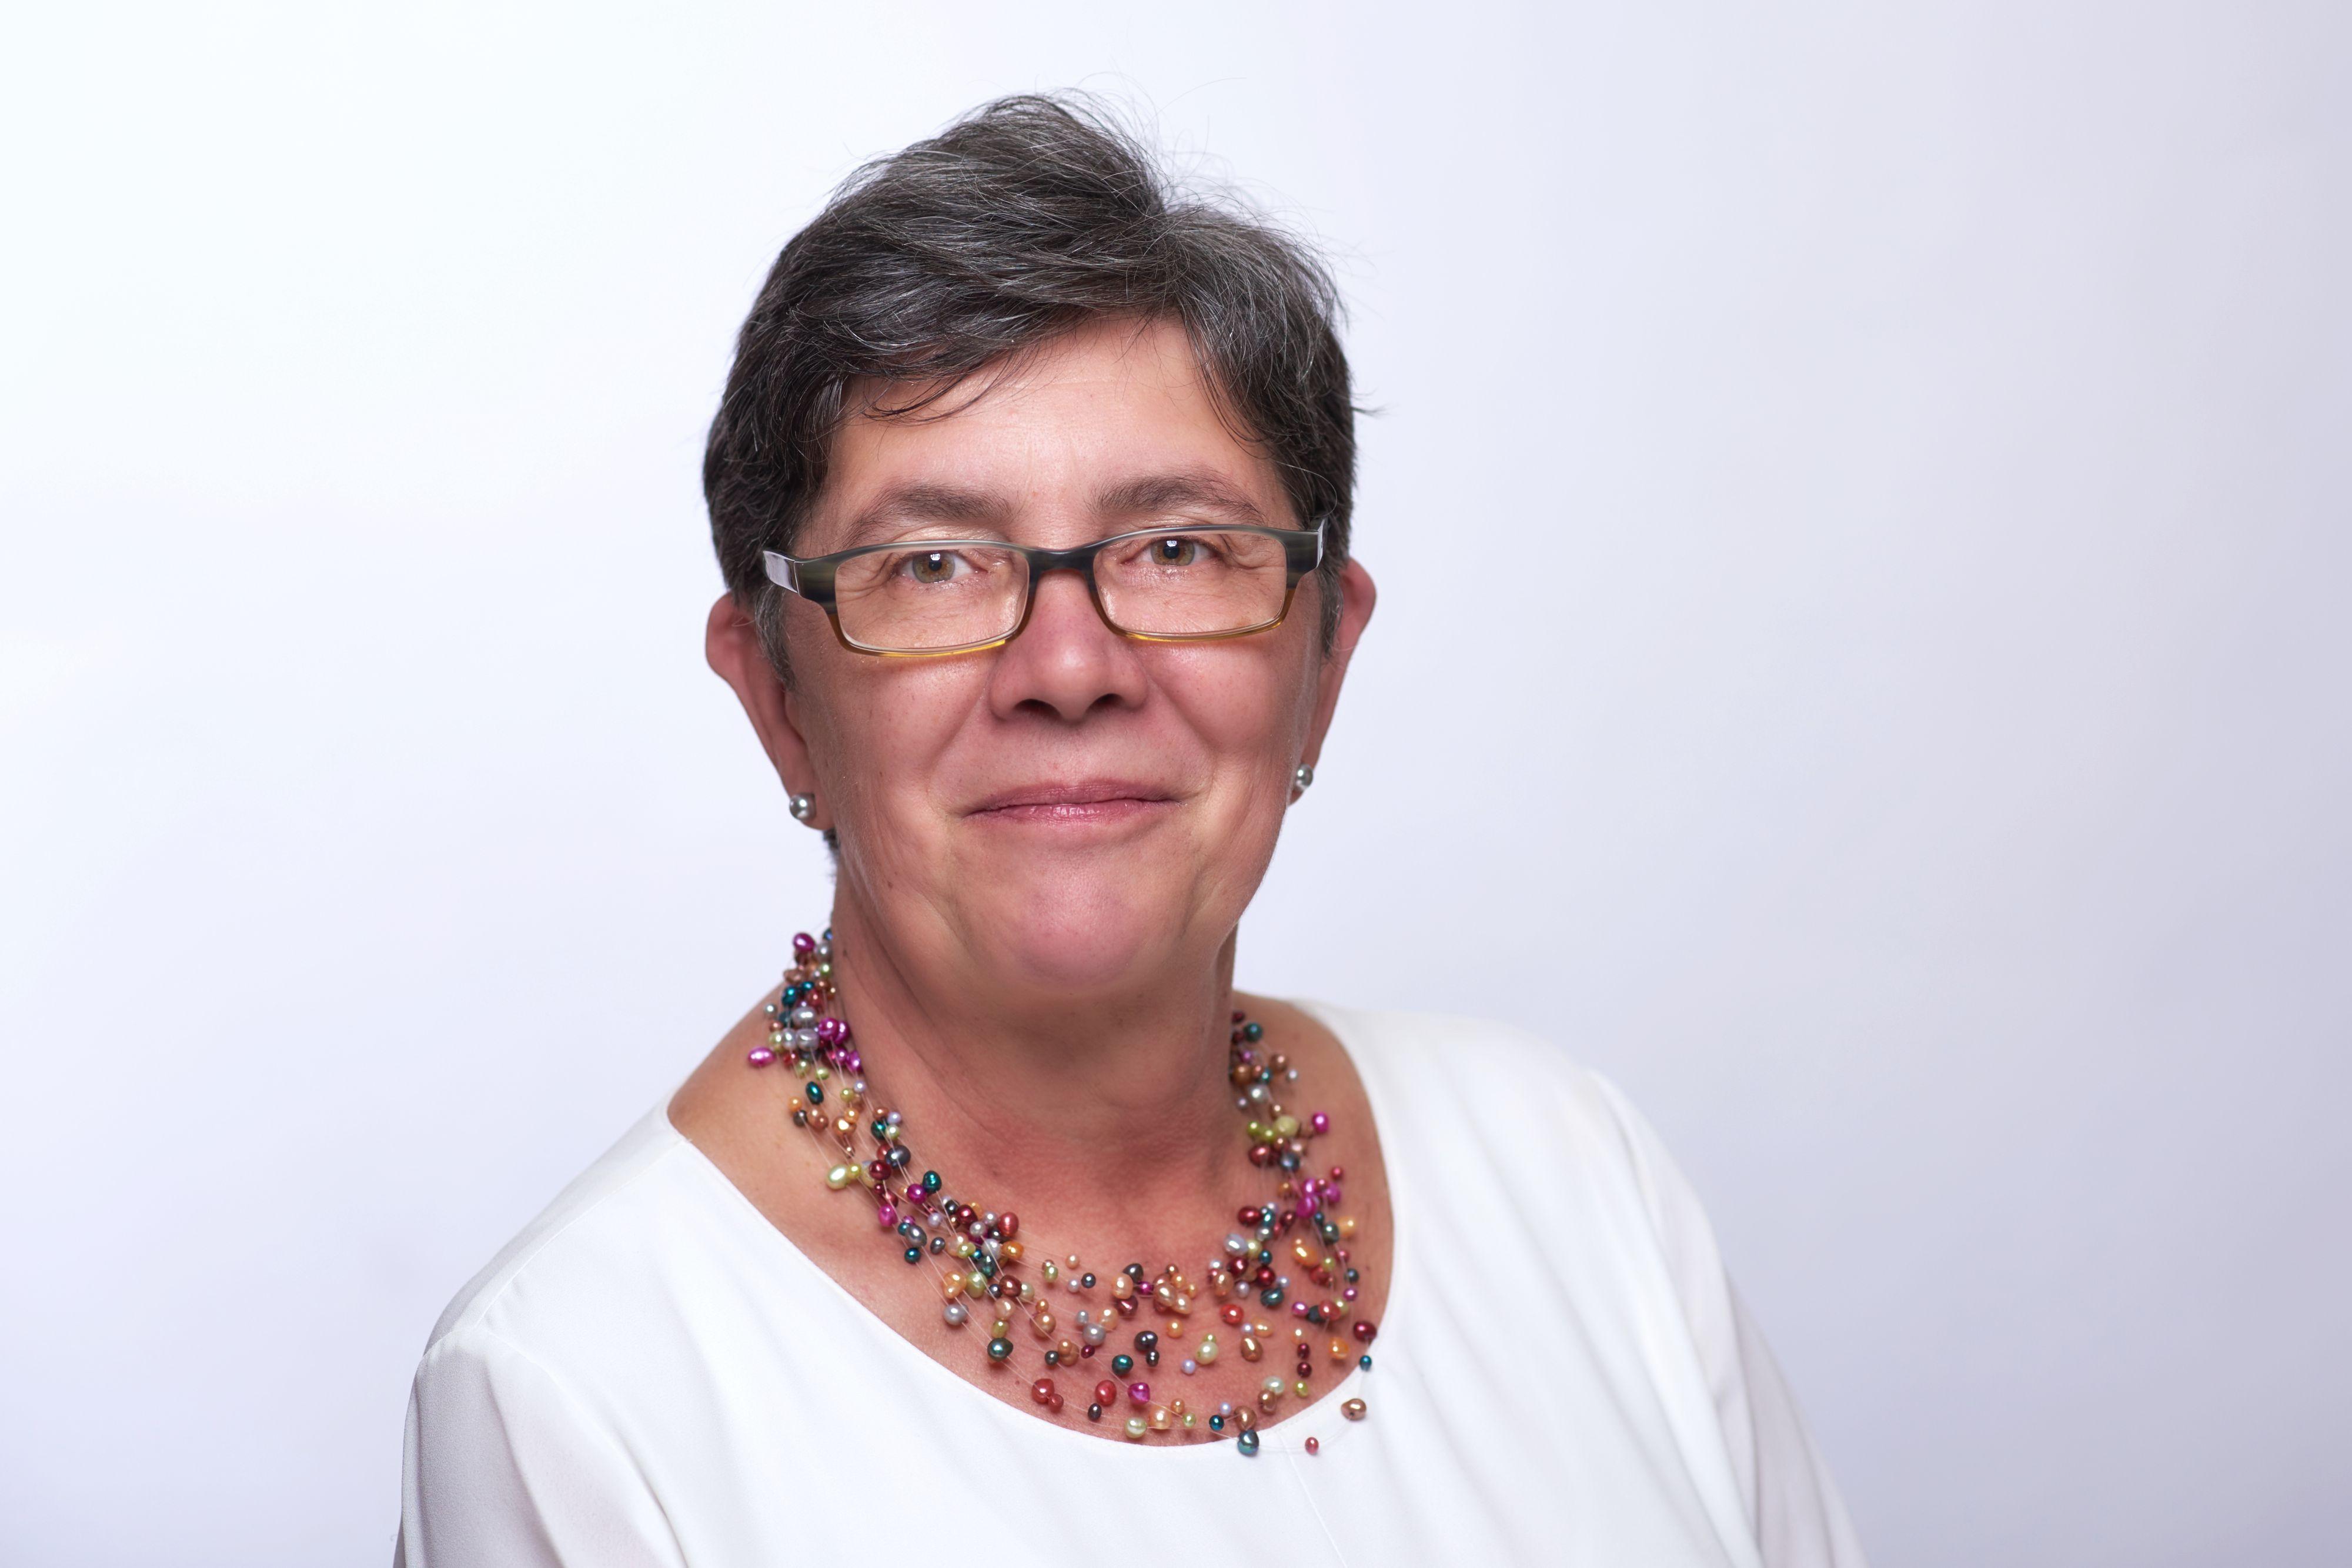 Monika Ackerschott